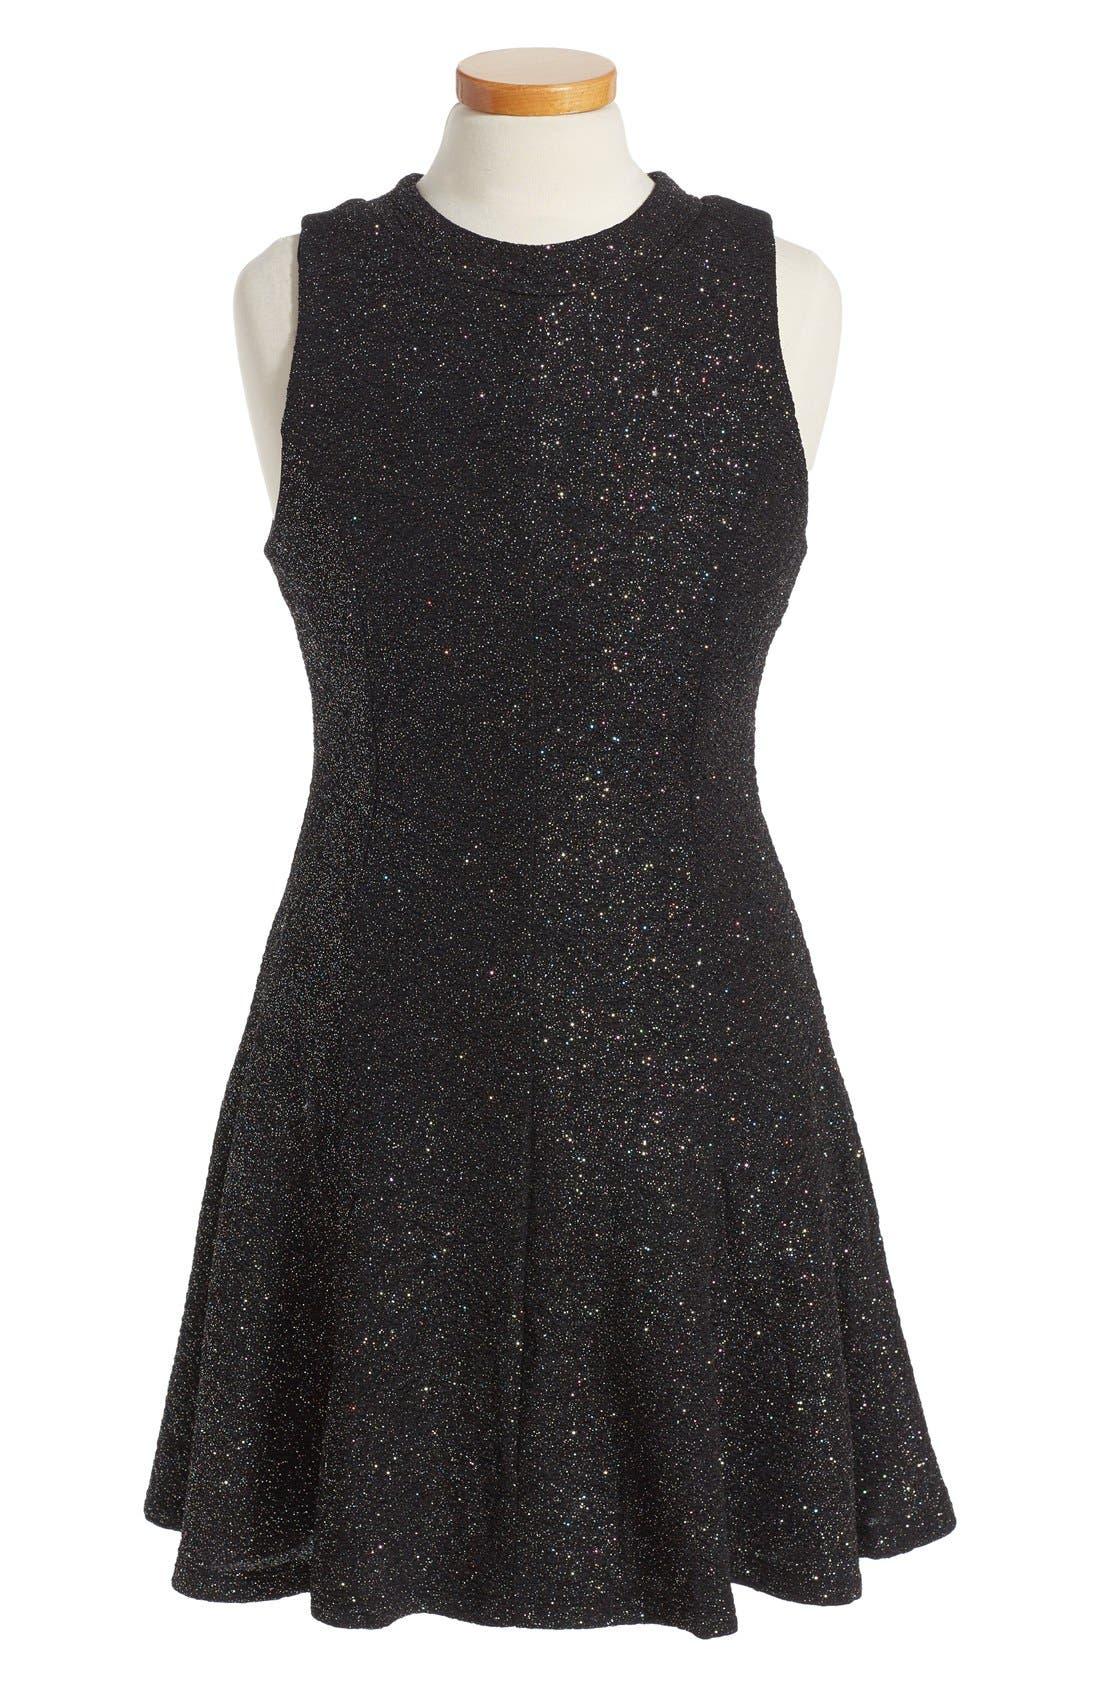 Shimmer Swing Dress,                             Main thumbnail 1, color,                             001